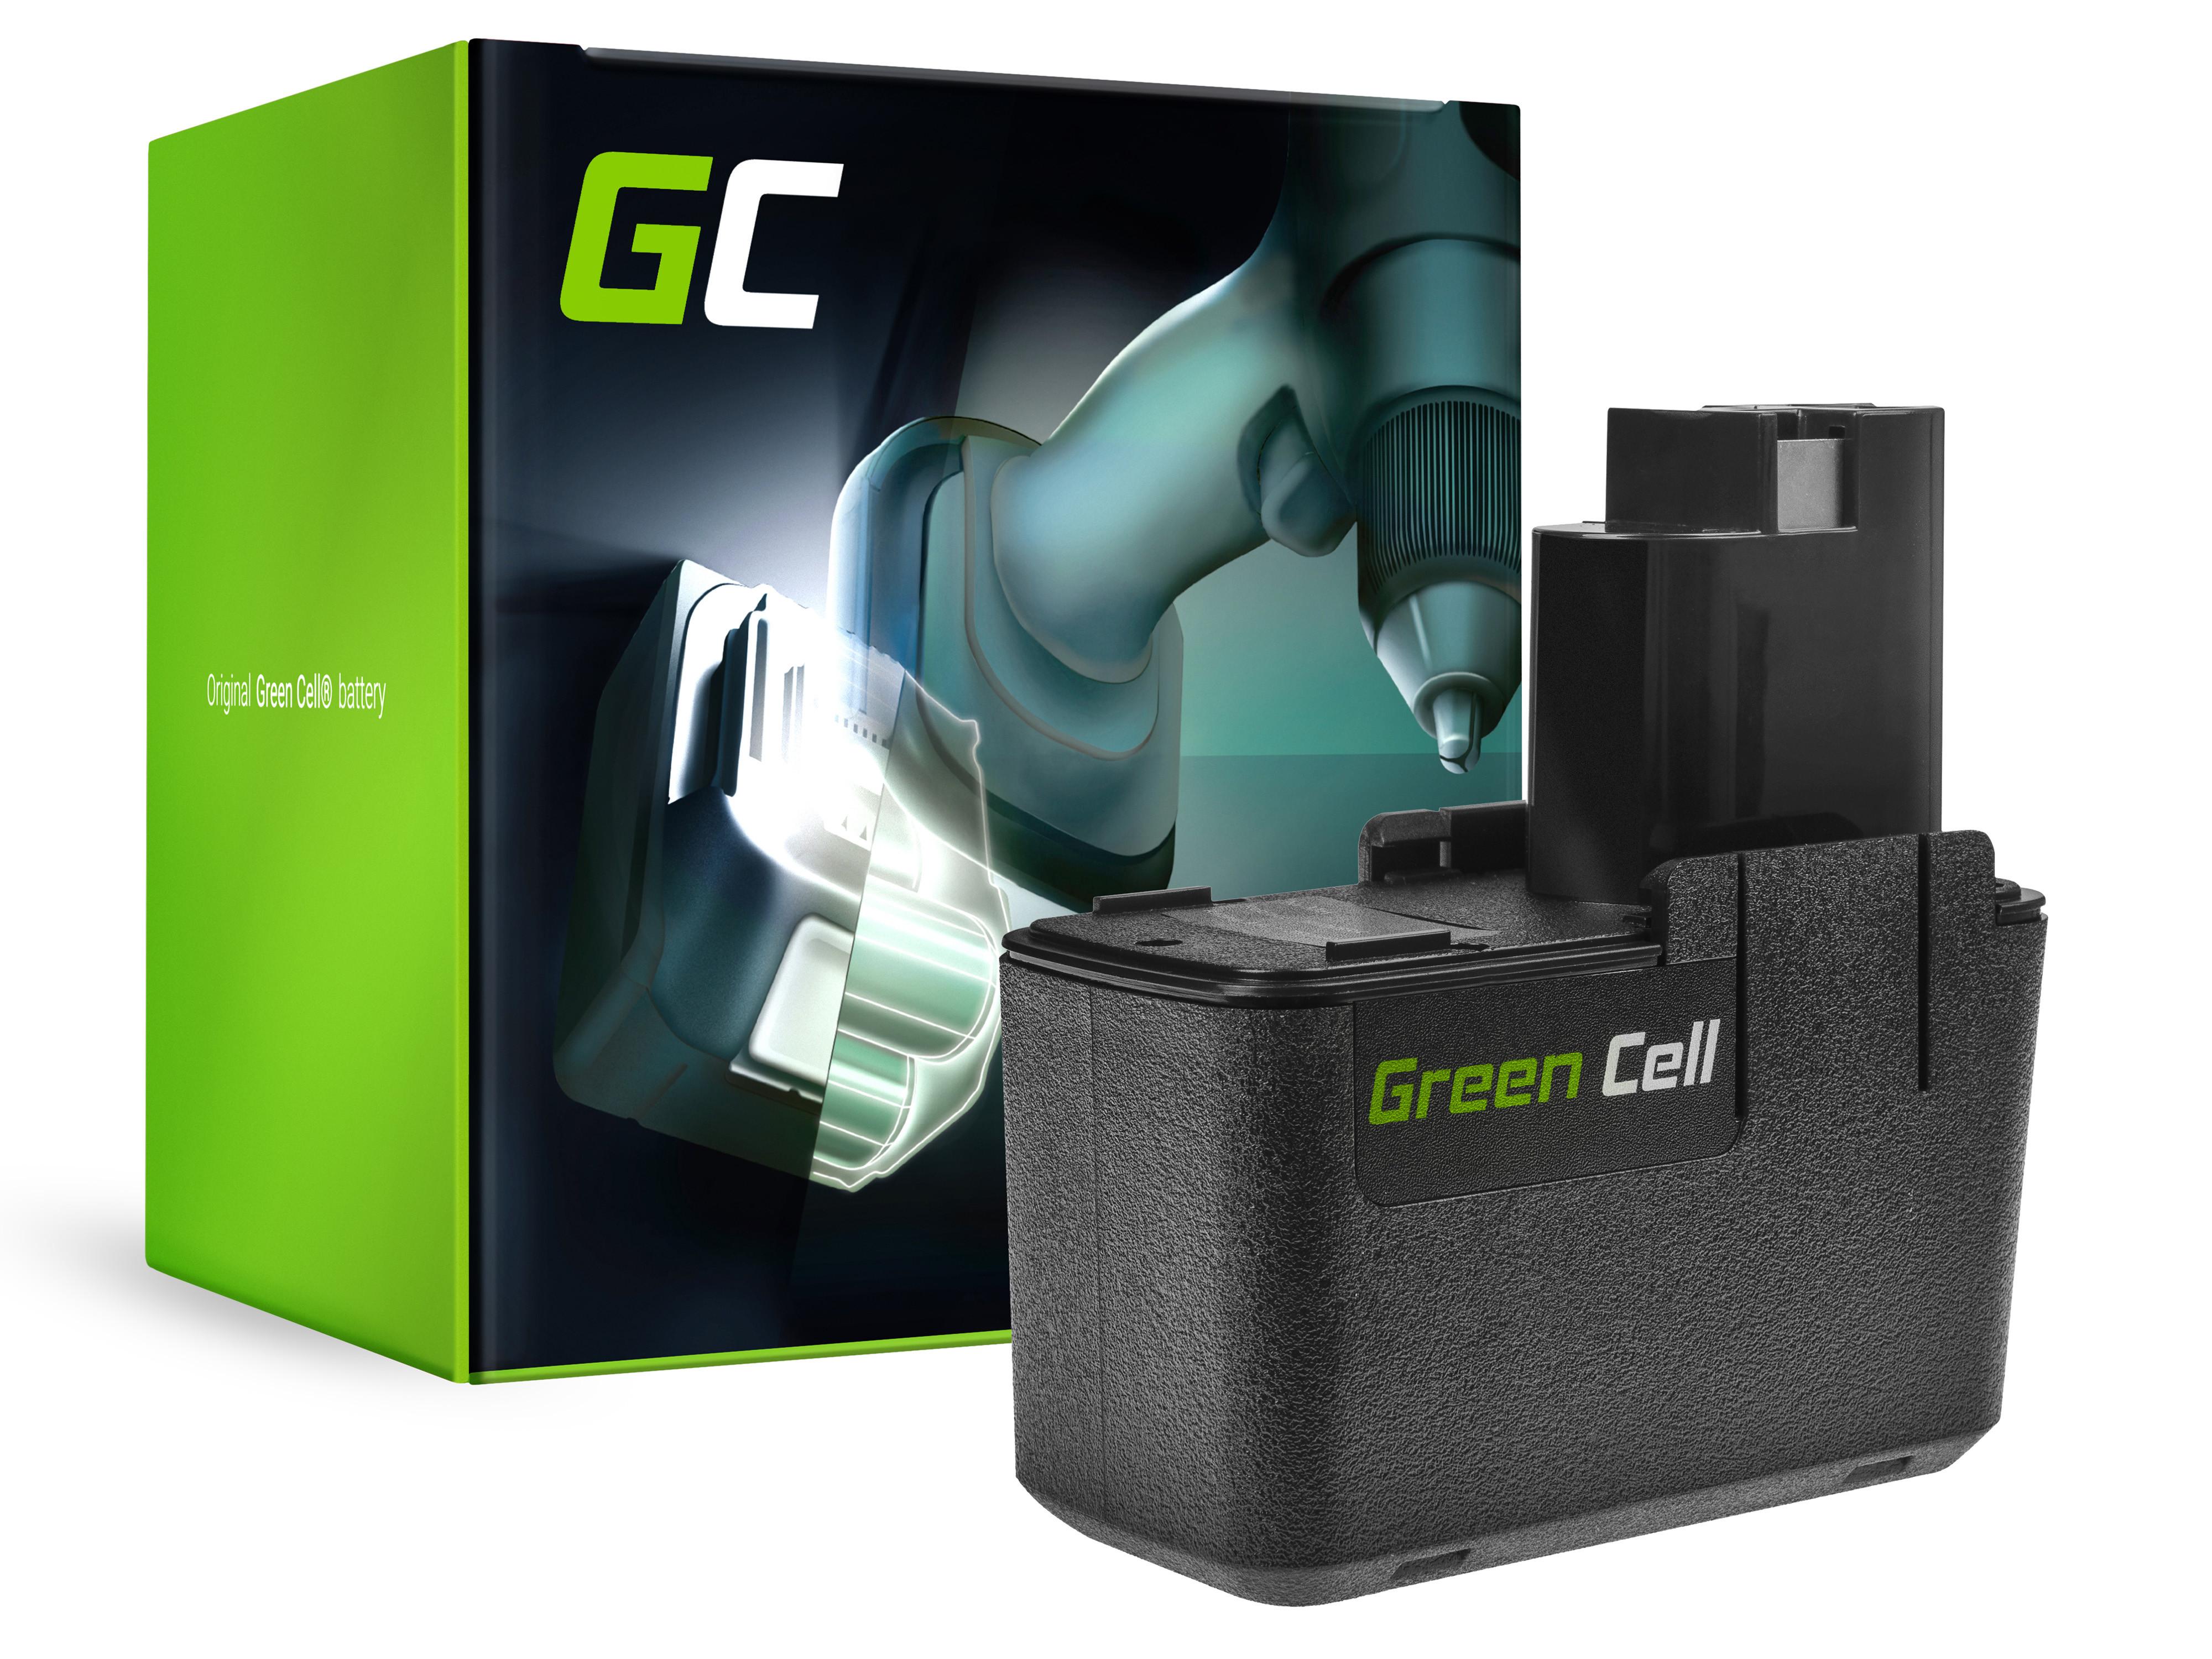 Green Cell Baterie Bosch BAT001 PSR GSR VES2 BH-974H 9.6V 2Ah